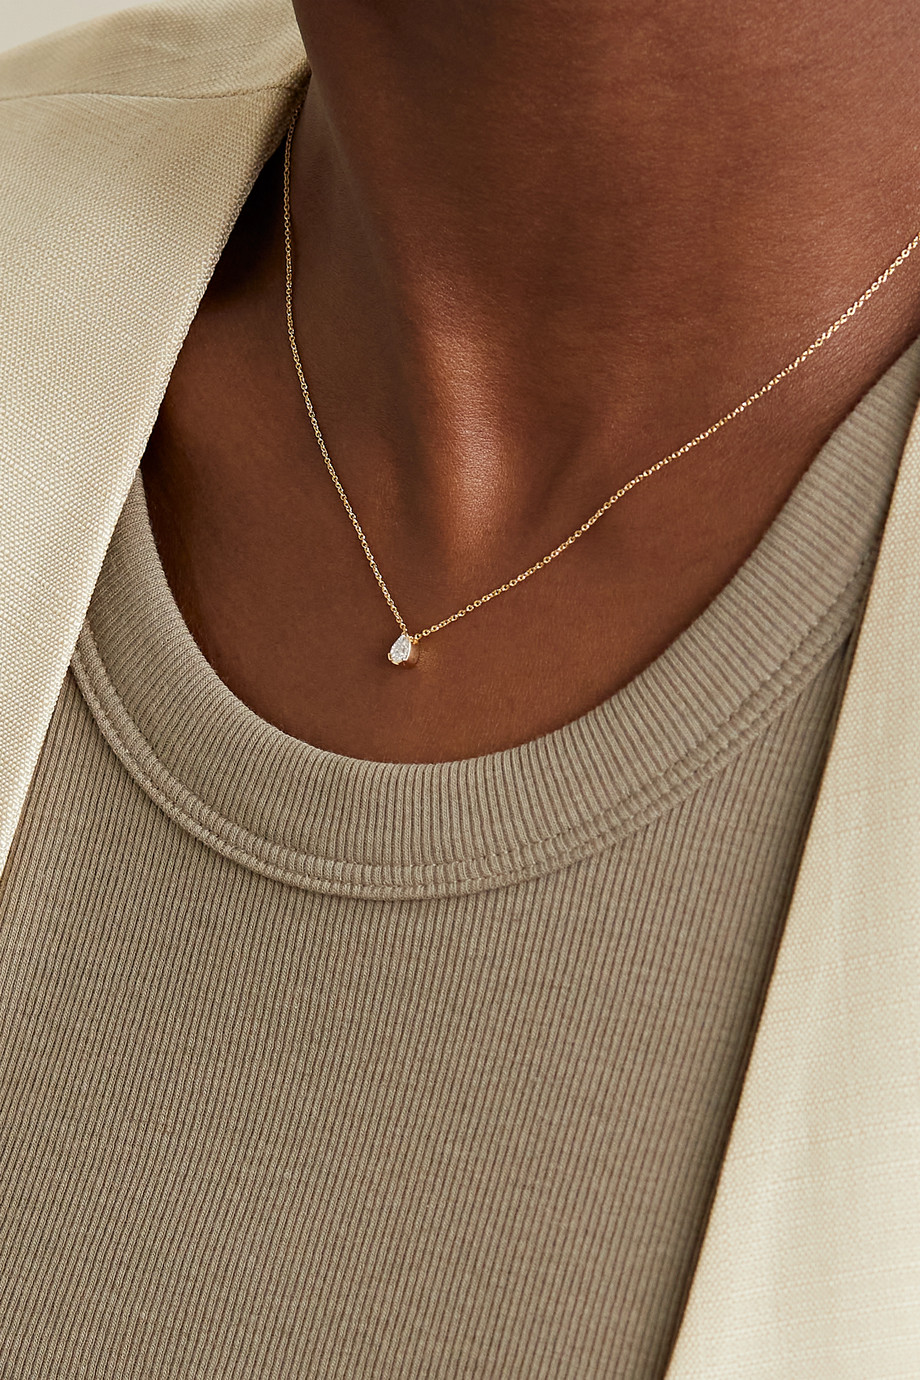 Sophie Bille Brahe Goutte 18-karat gold diamond necklace